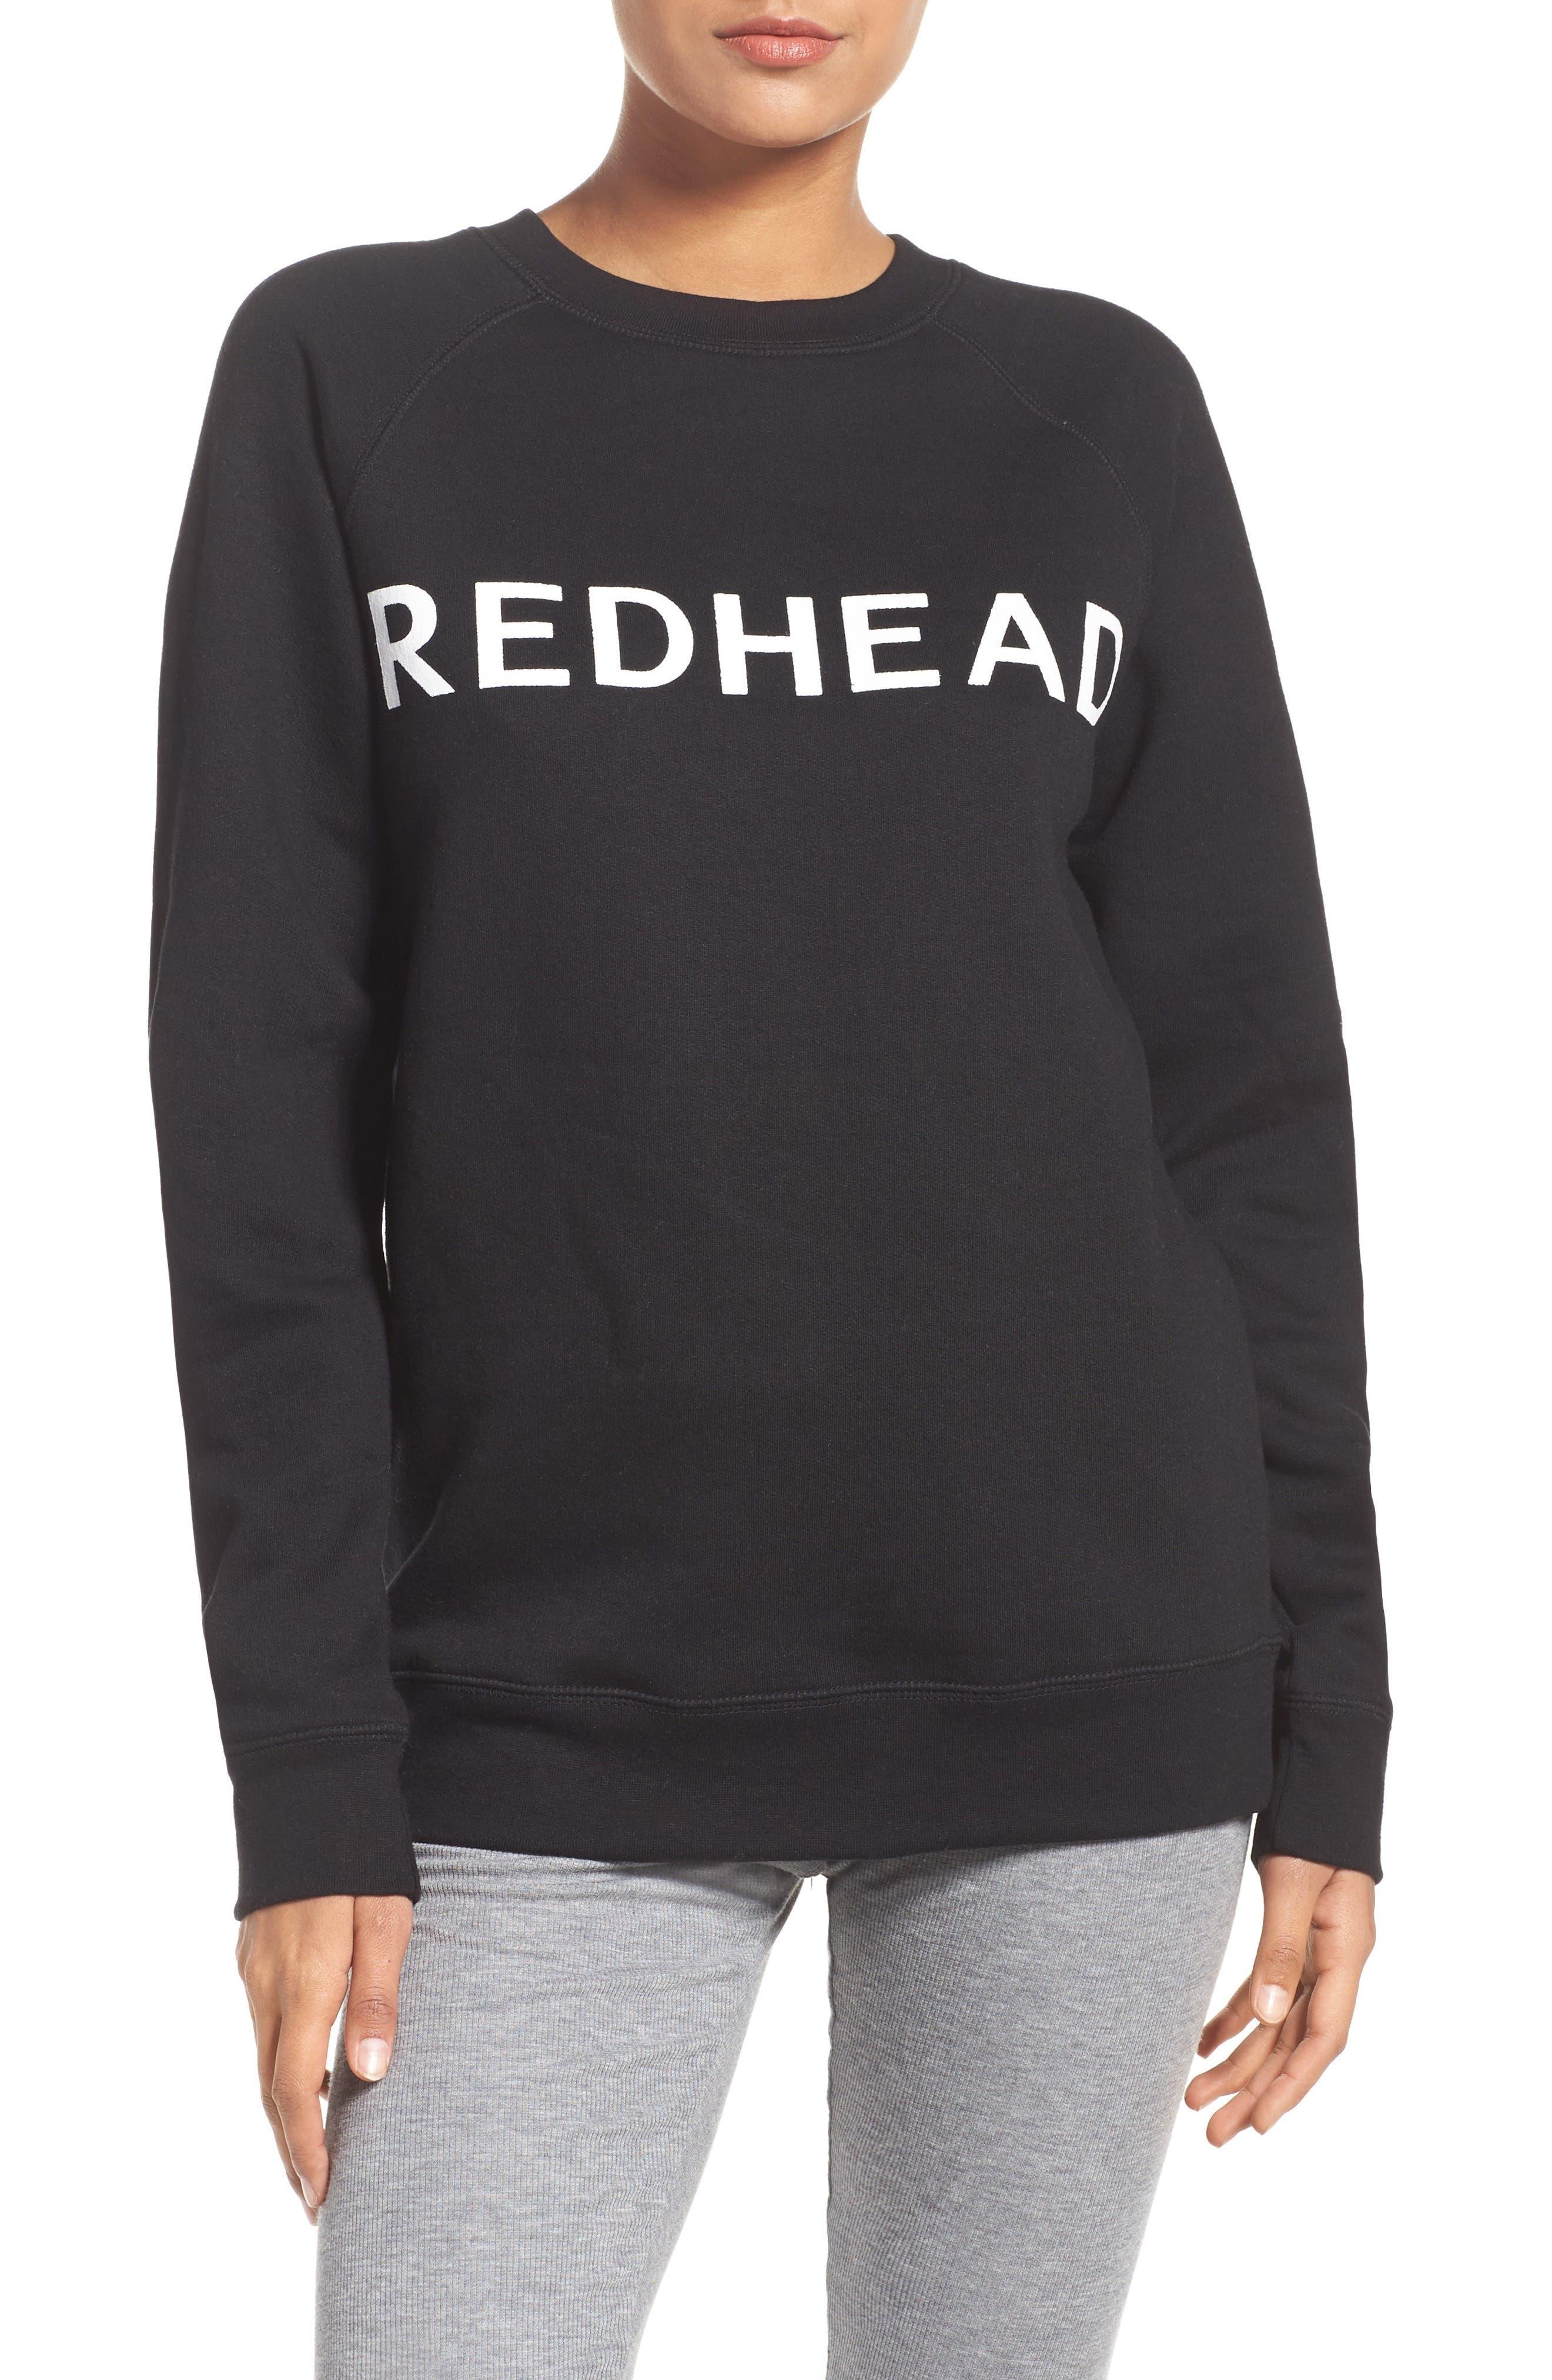 Redhead Lounge Sweatshirt,                             Main thumbnail 1, color,                             001